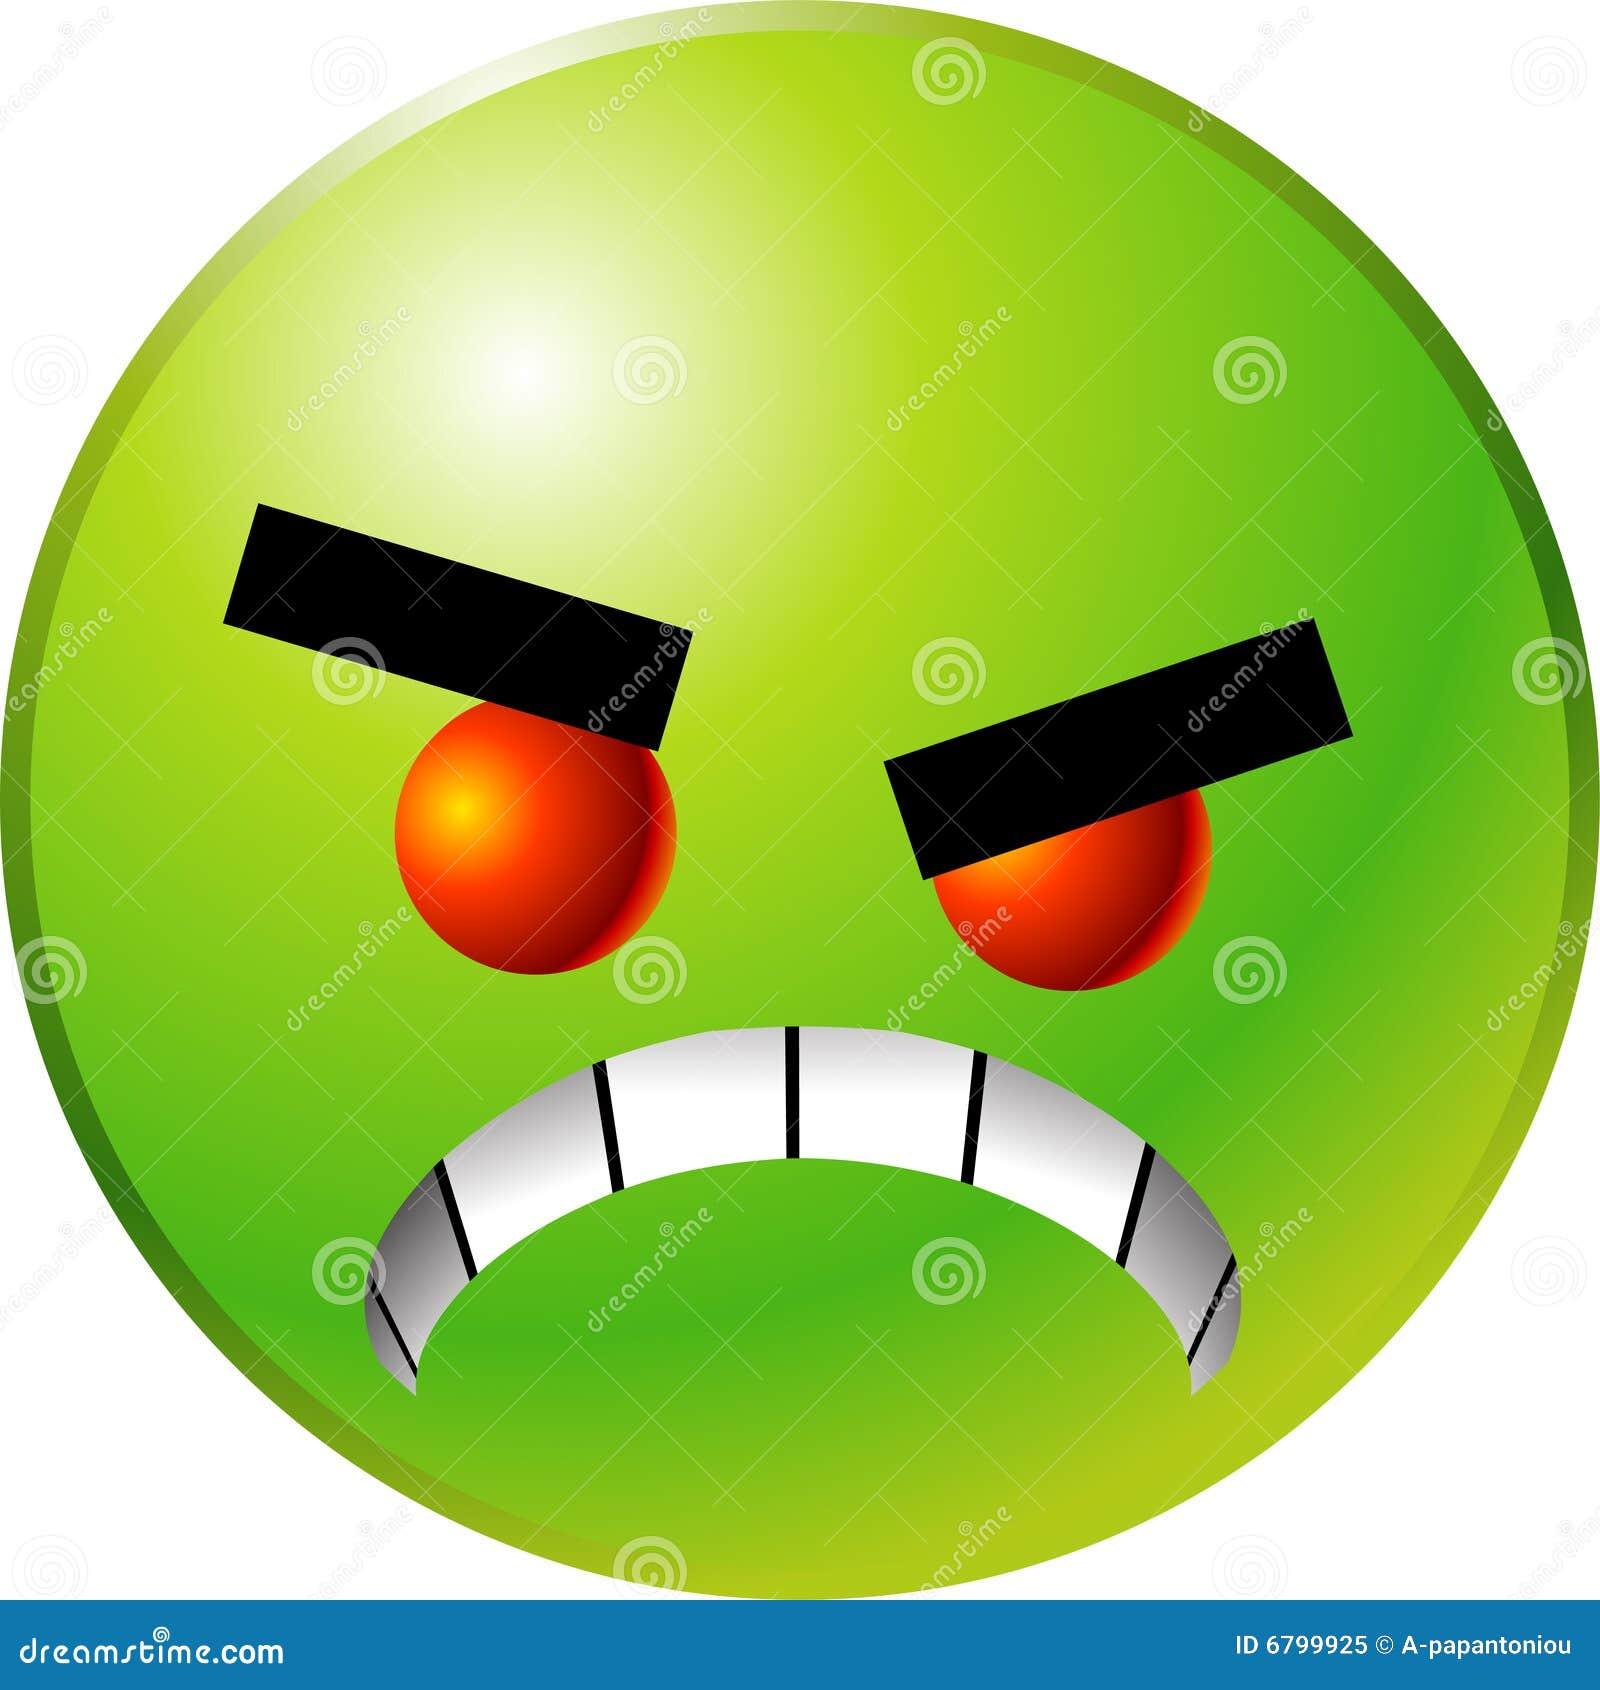 Emoticon Smiley Face Royalty Free Stock Photo - Image: 6799925